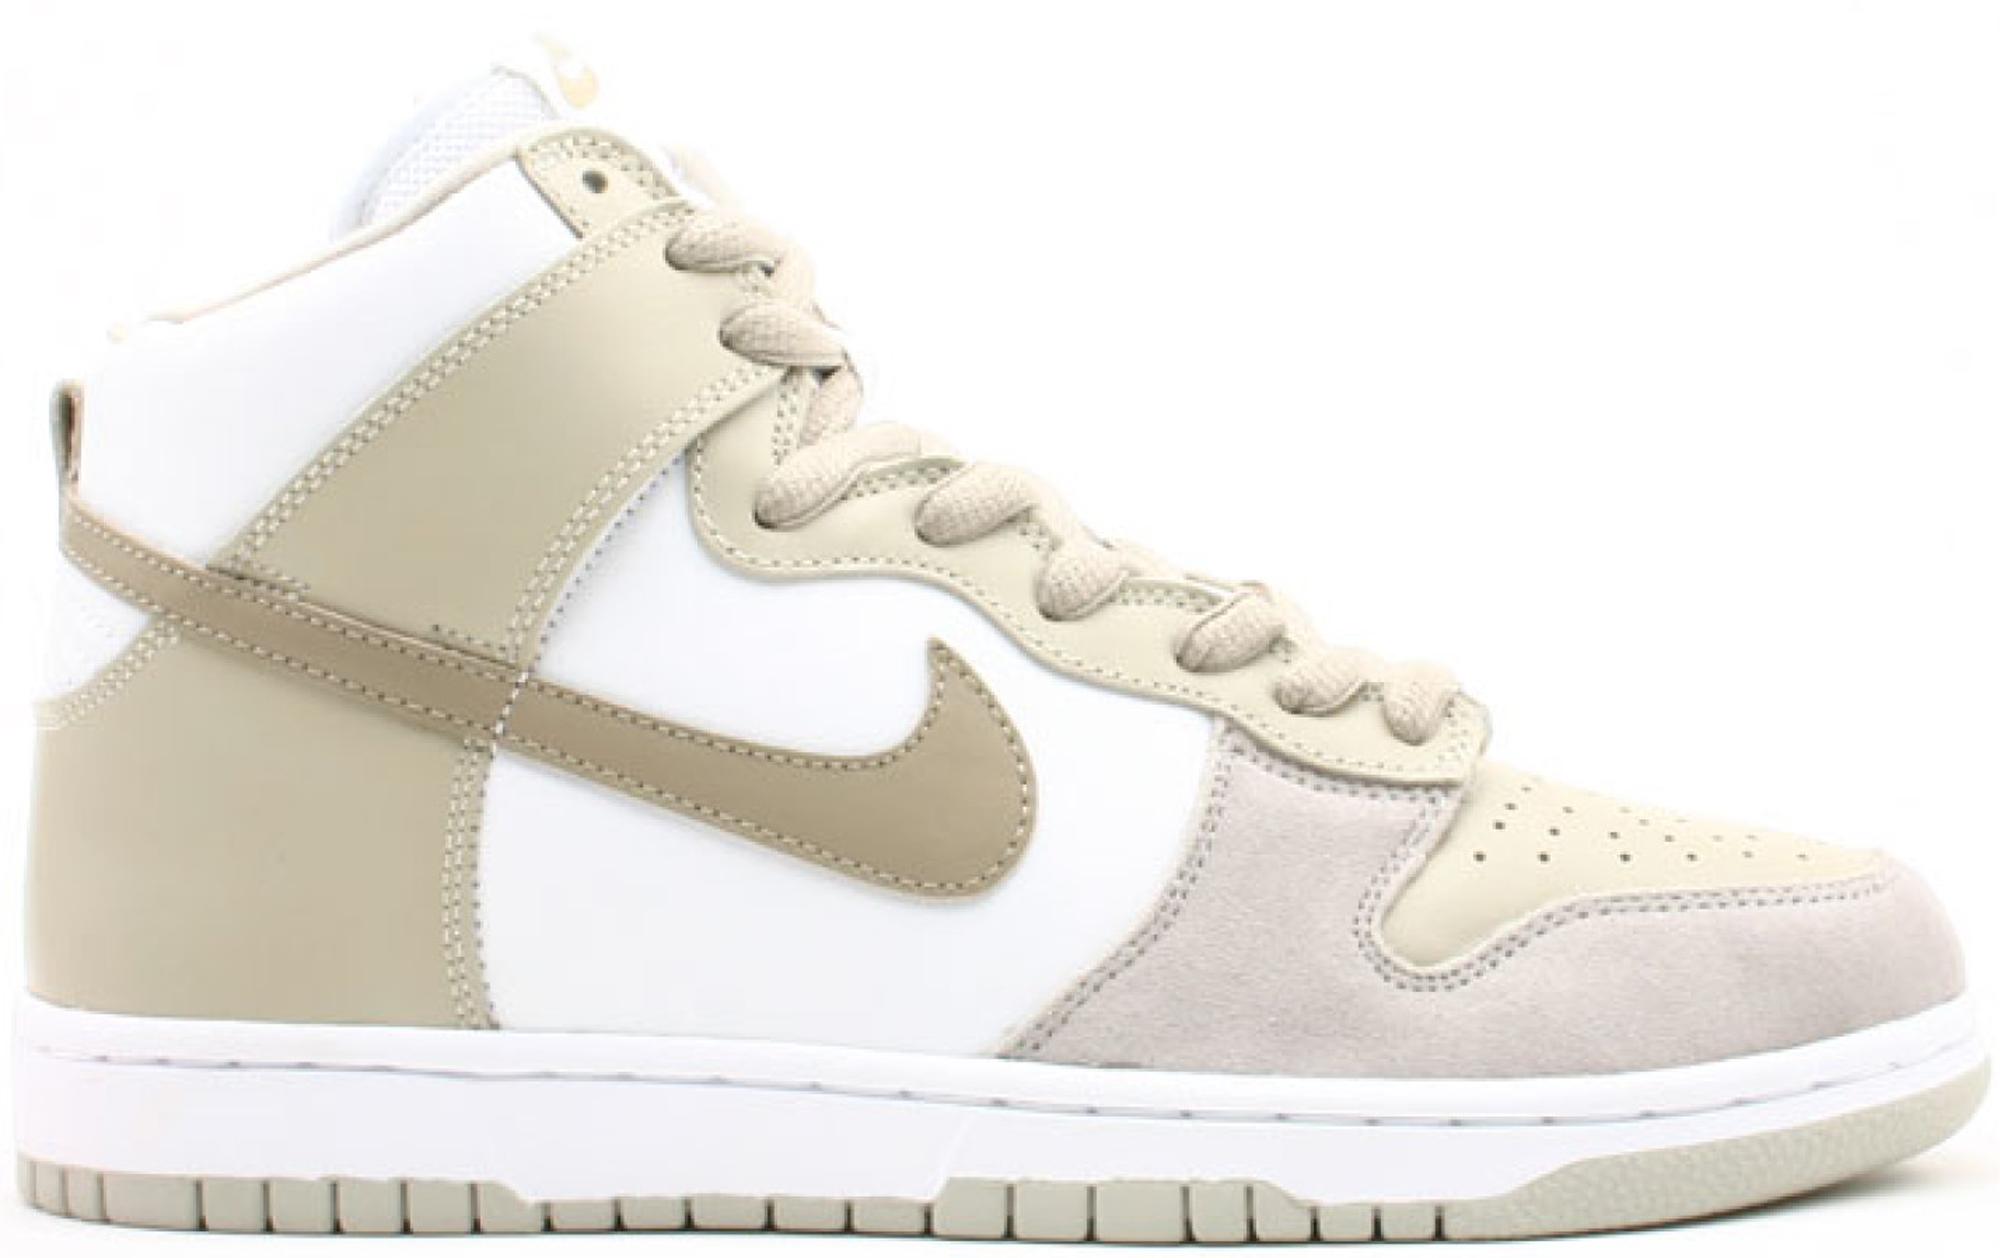 Nike SB Dunk High Khaki